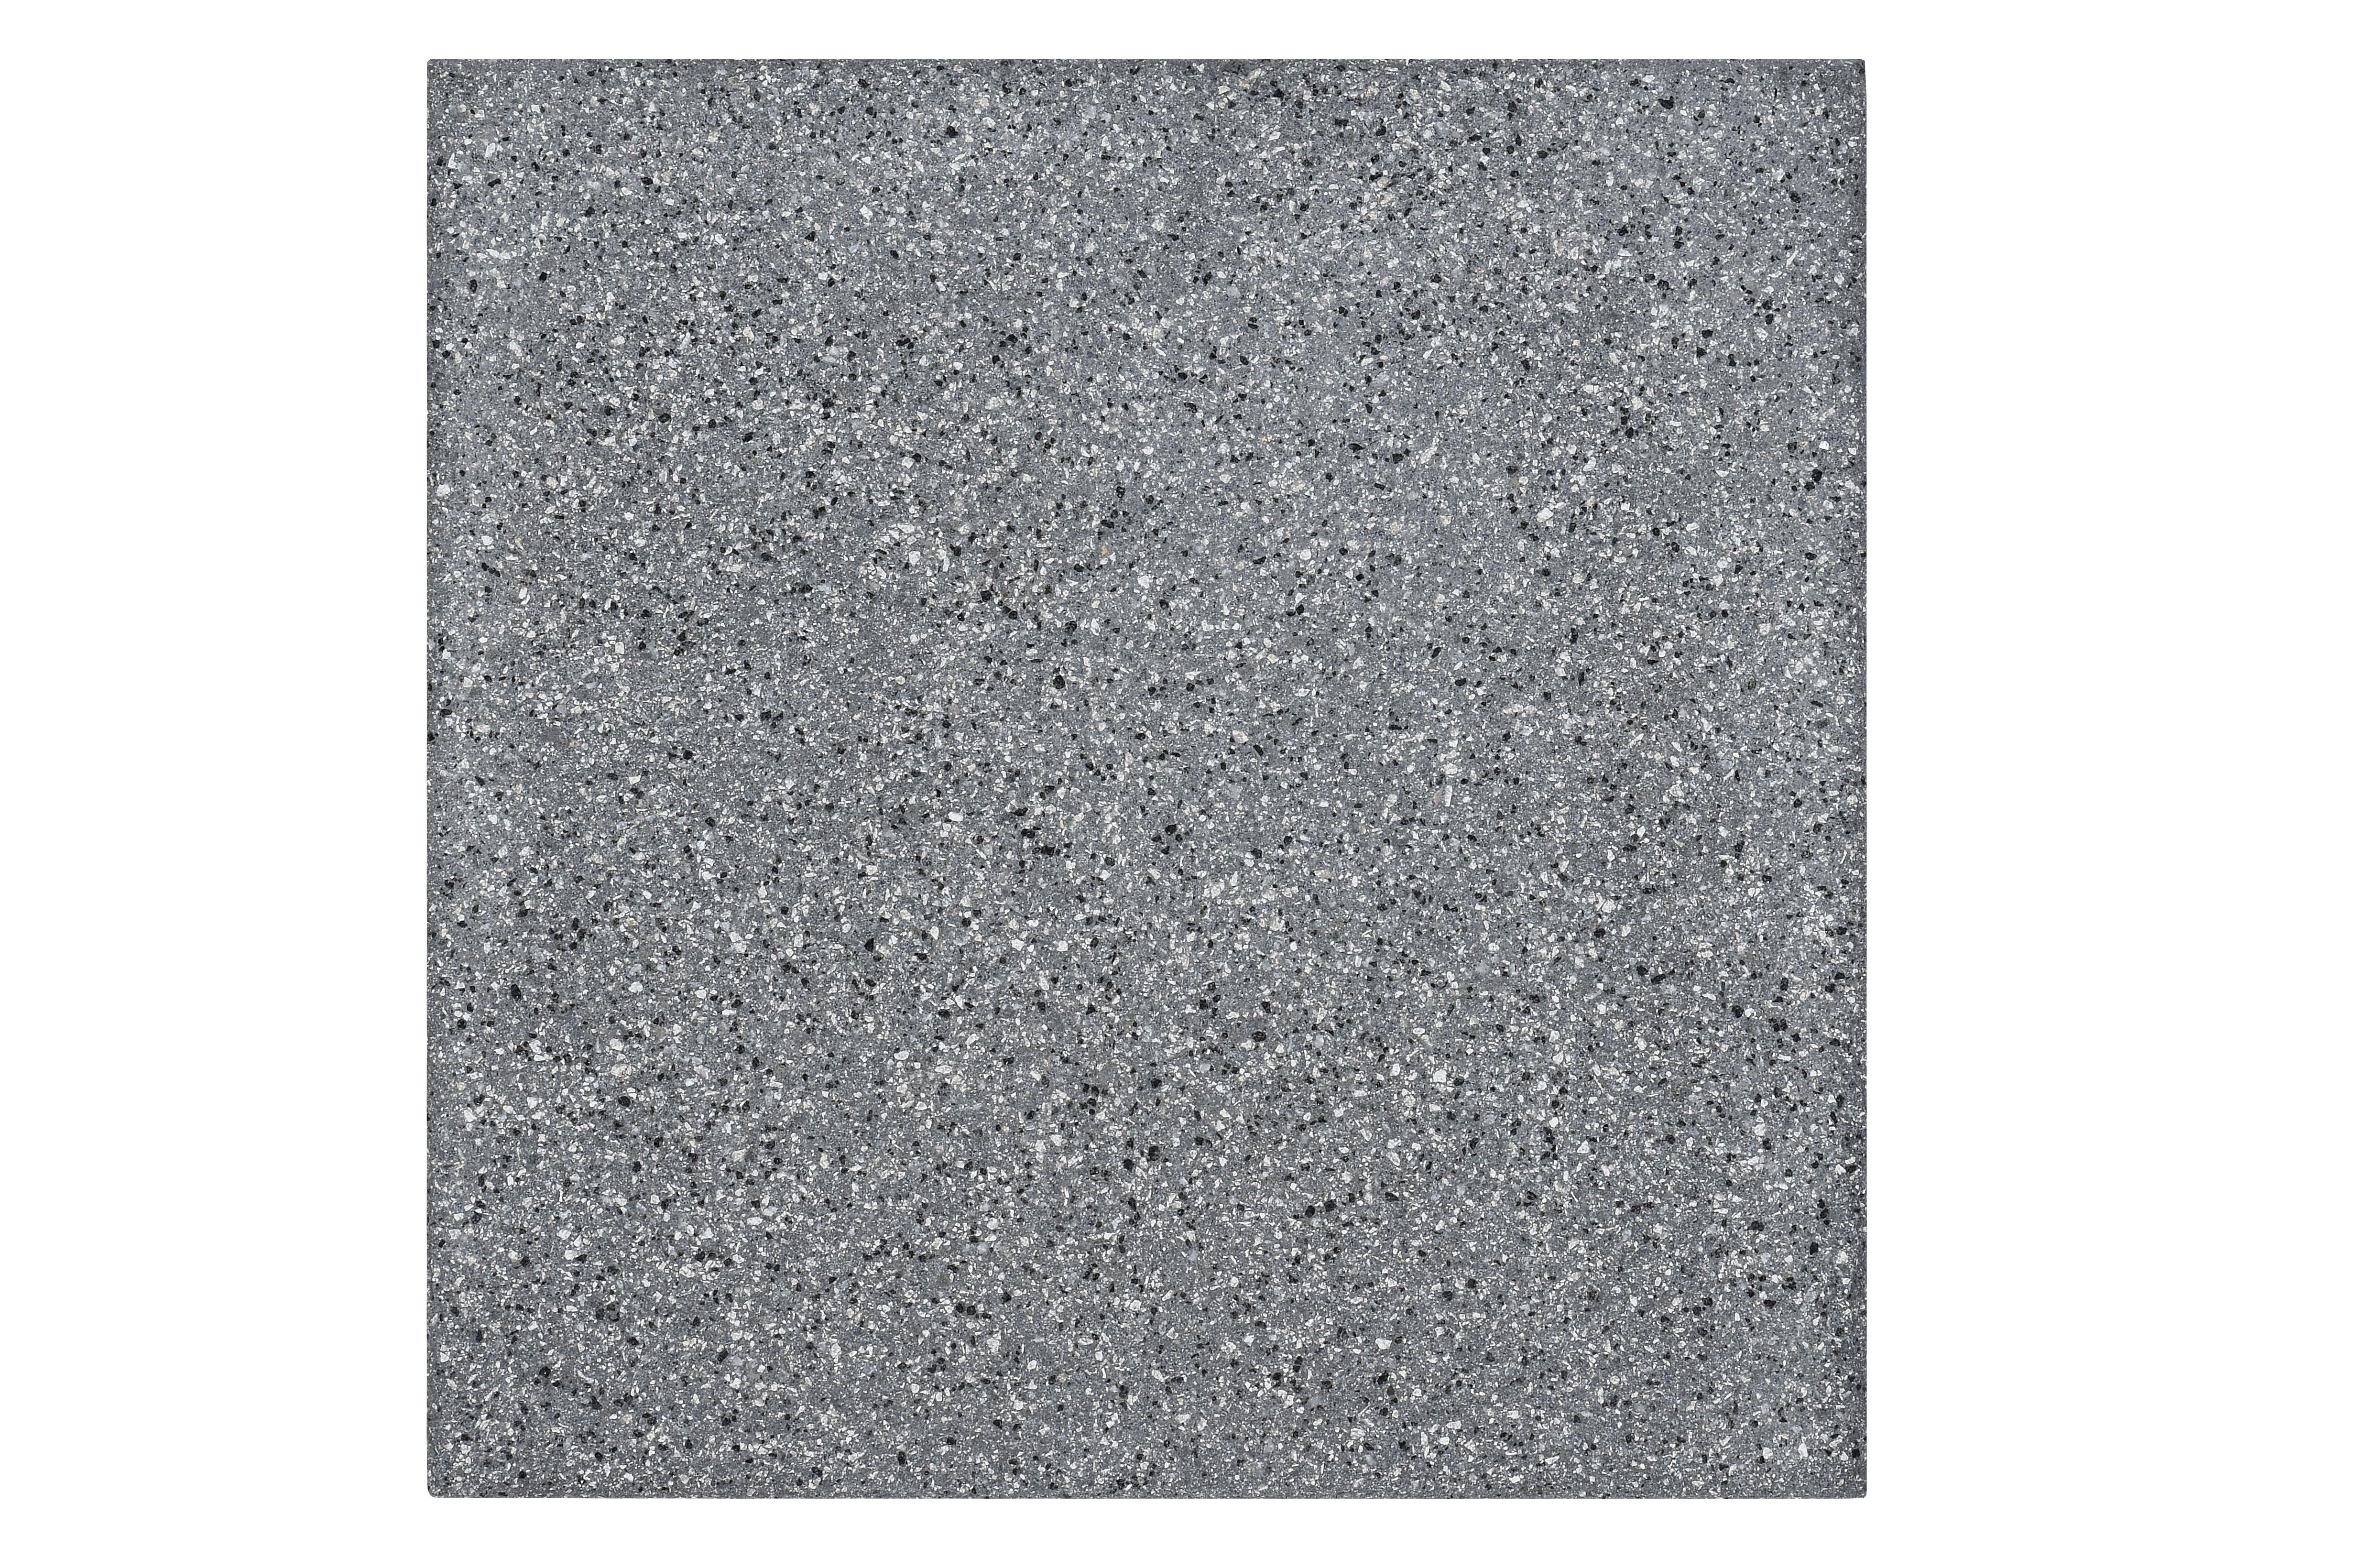 Kemmler Terrassenplatte Barcelona Xx Mm Kugelgestrahlt - Betonplatten dunkelgrau